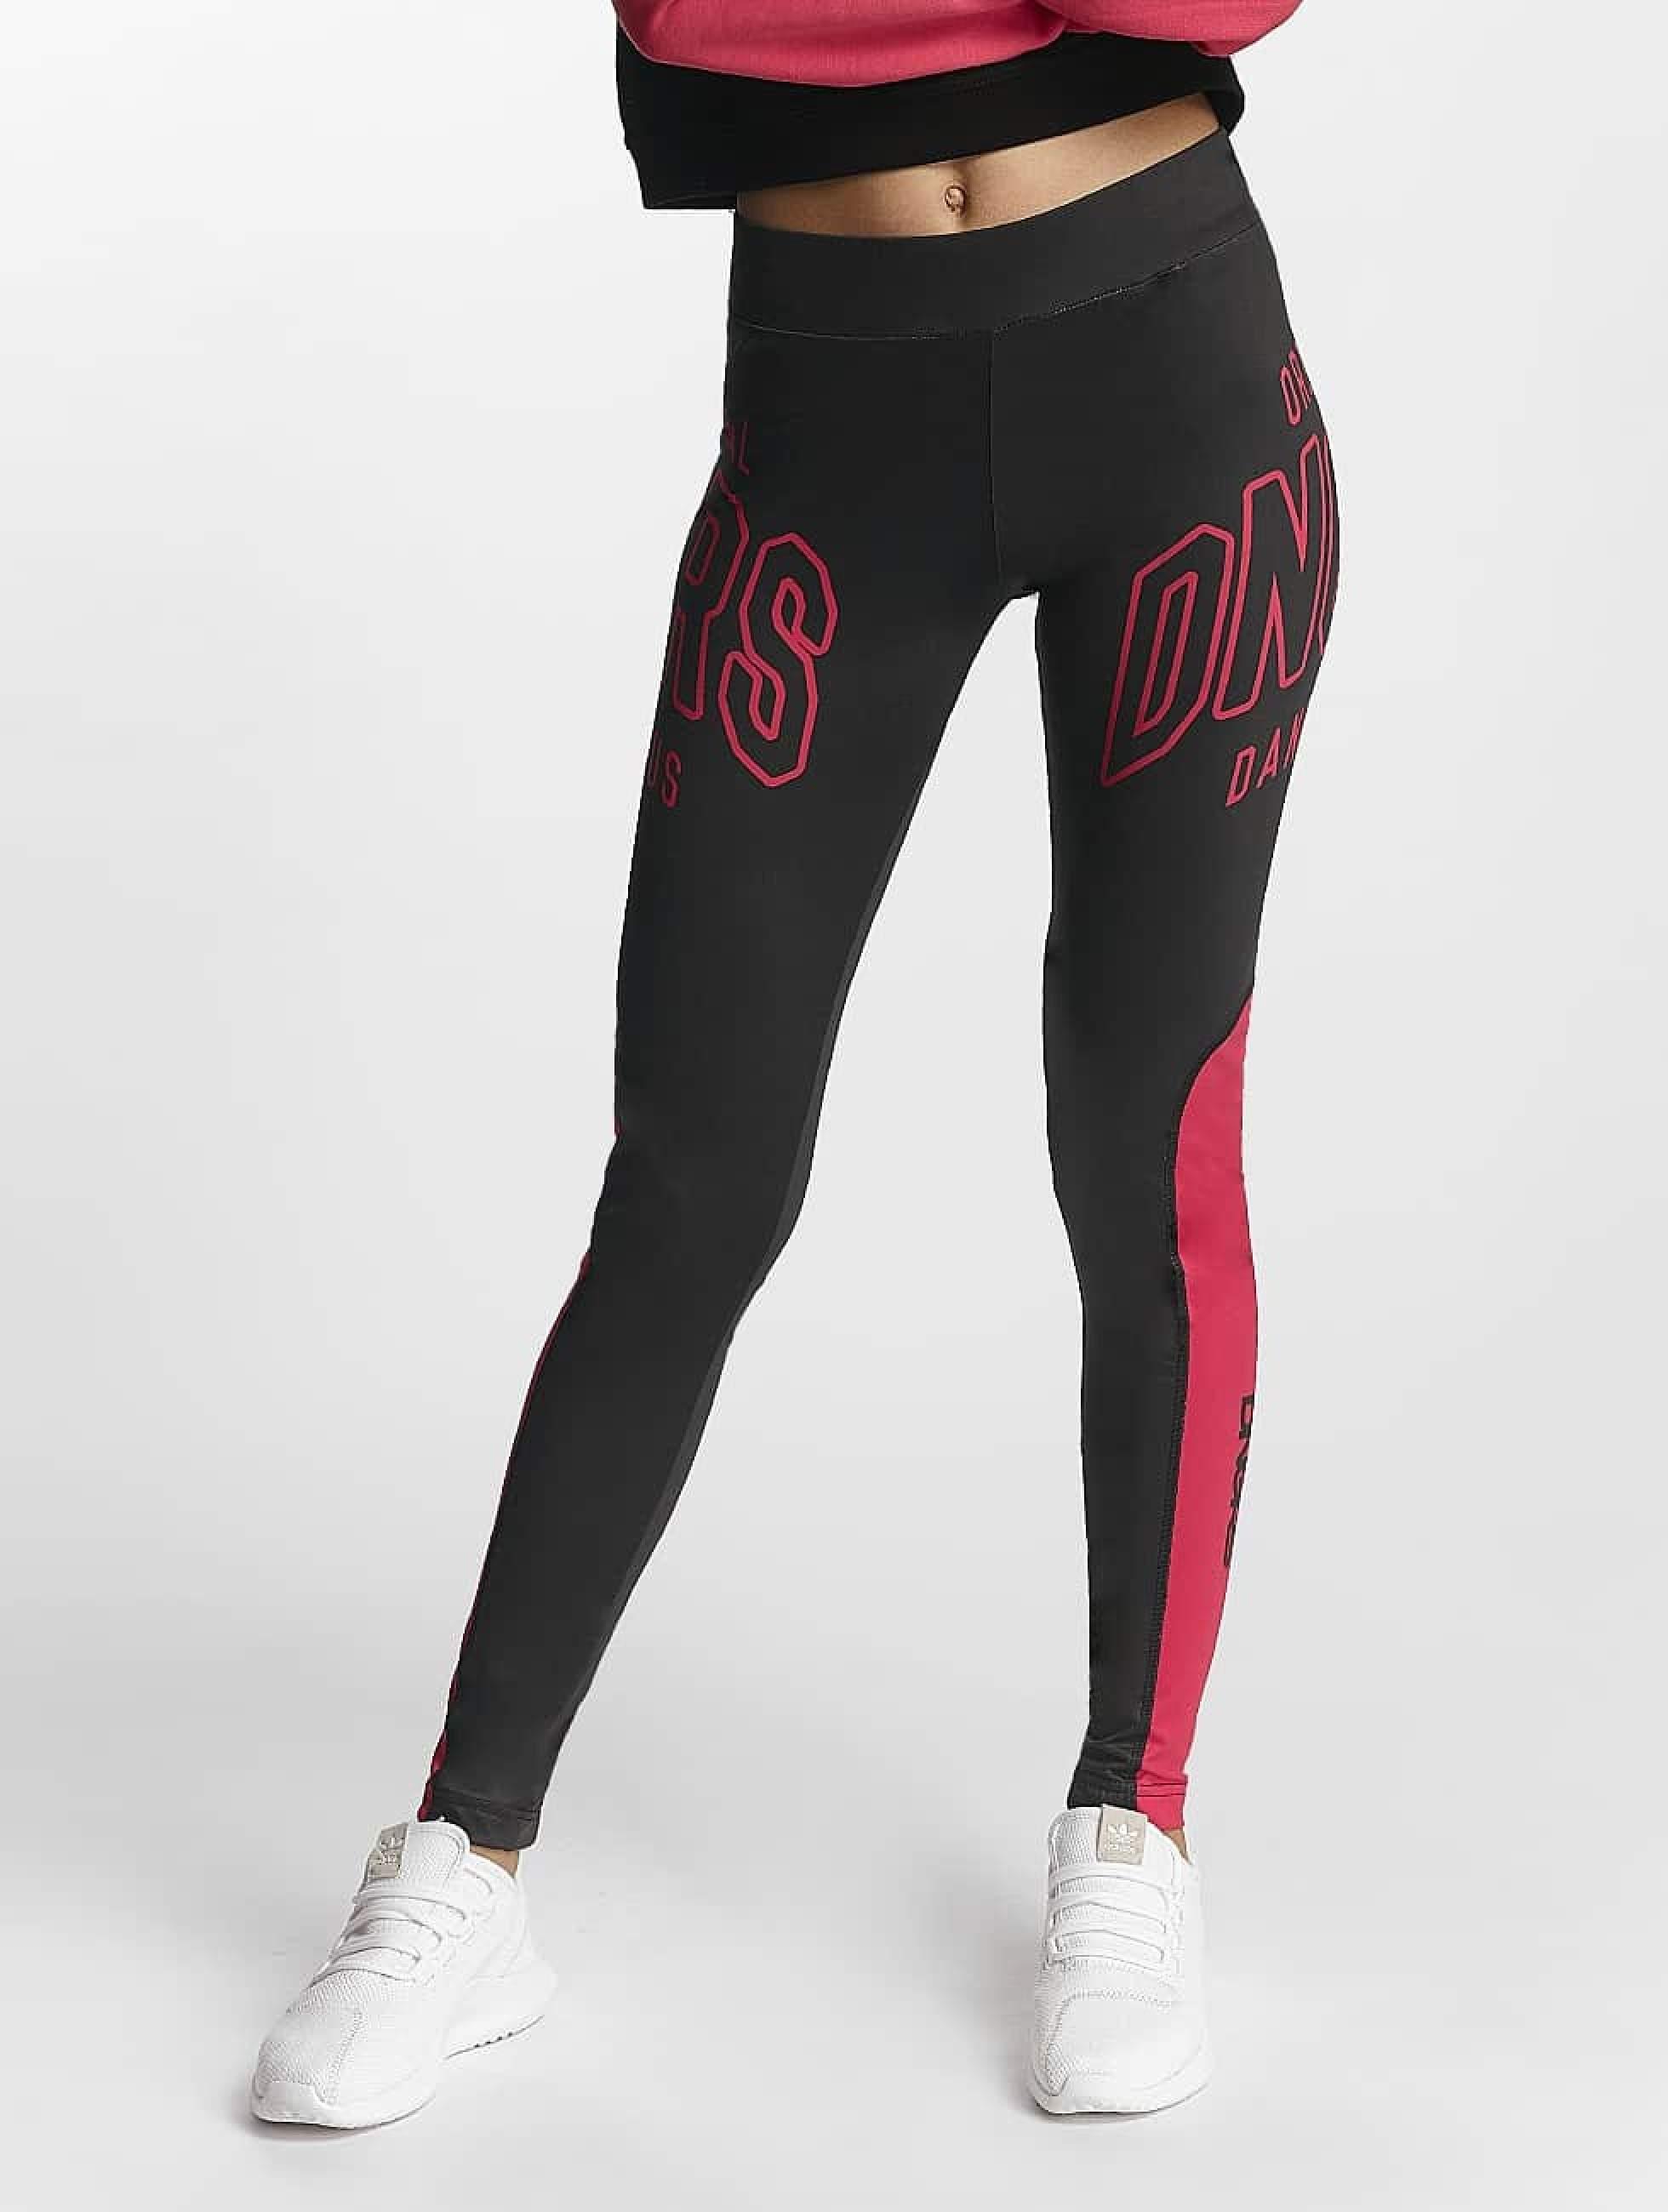 Dangerous DNGRS / Legging/Tregging OriginalD in pink L